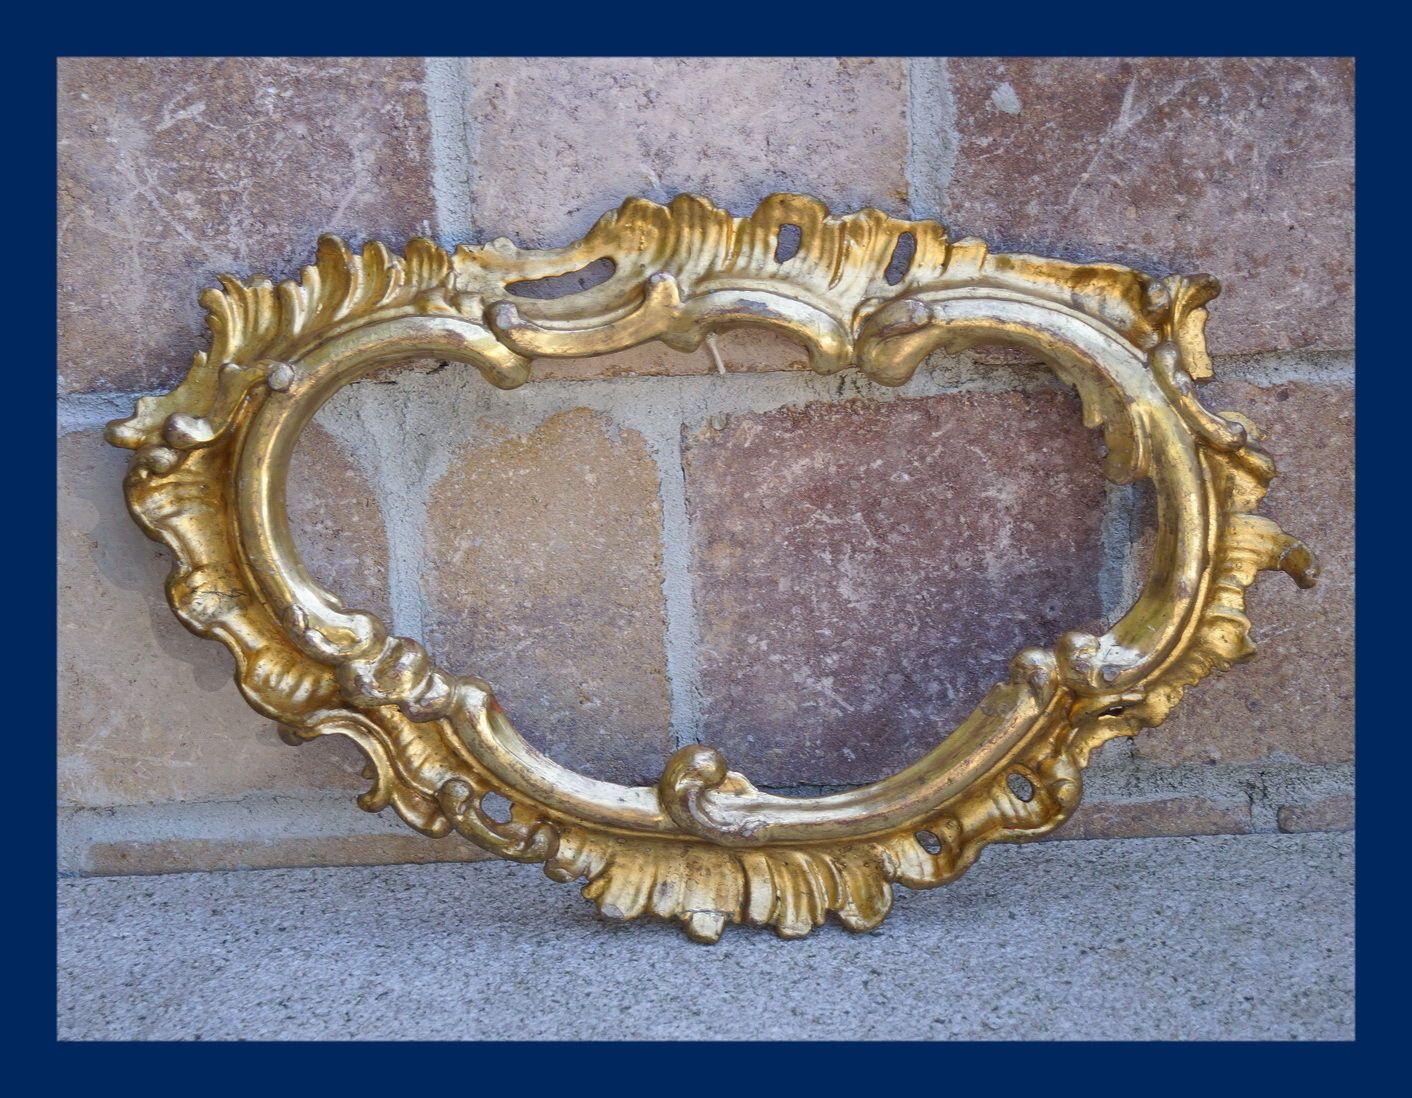 Spiegelrahmen, Kanontafel - Holz geschnitzt, vergoldet, 18. Jahrhundert (# 4968) | eBay